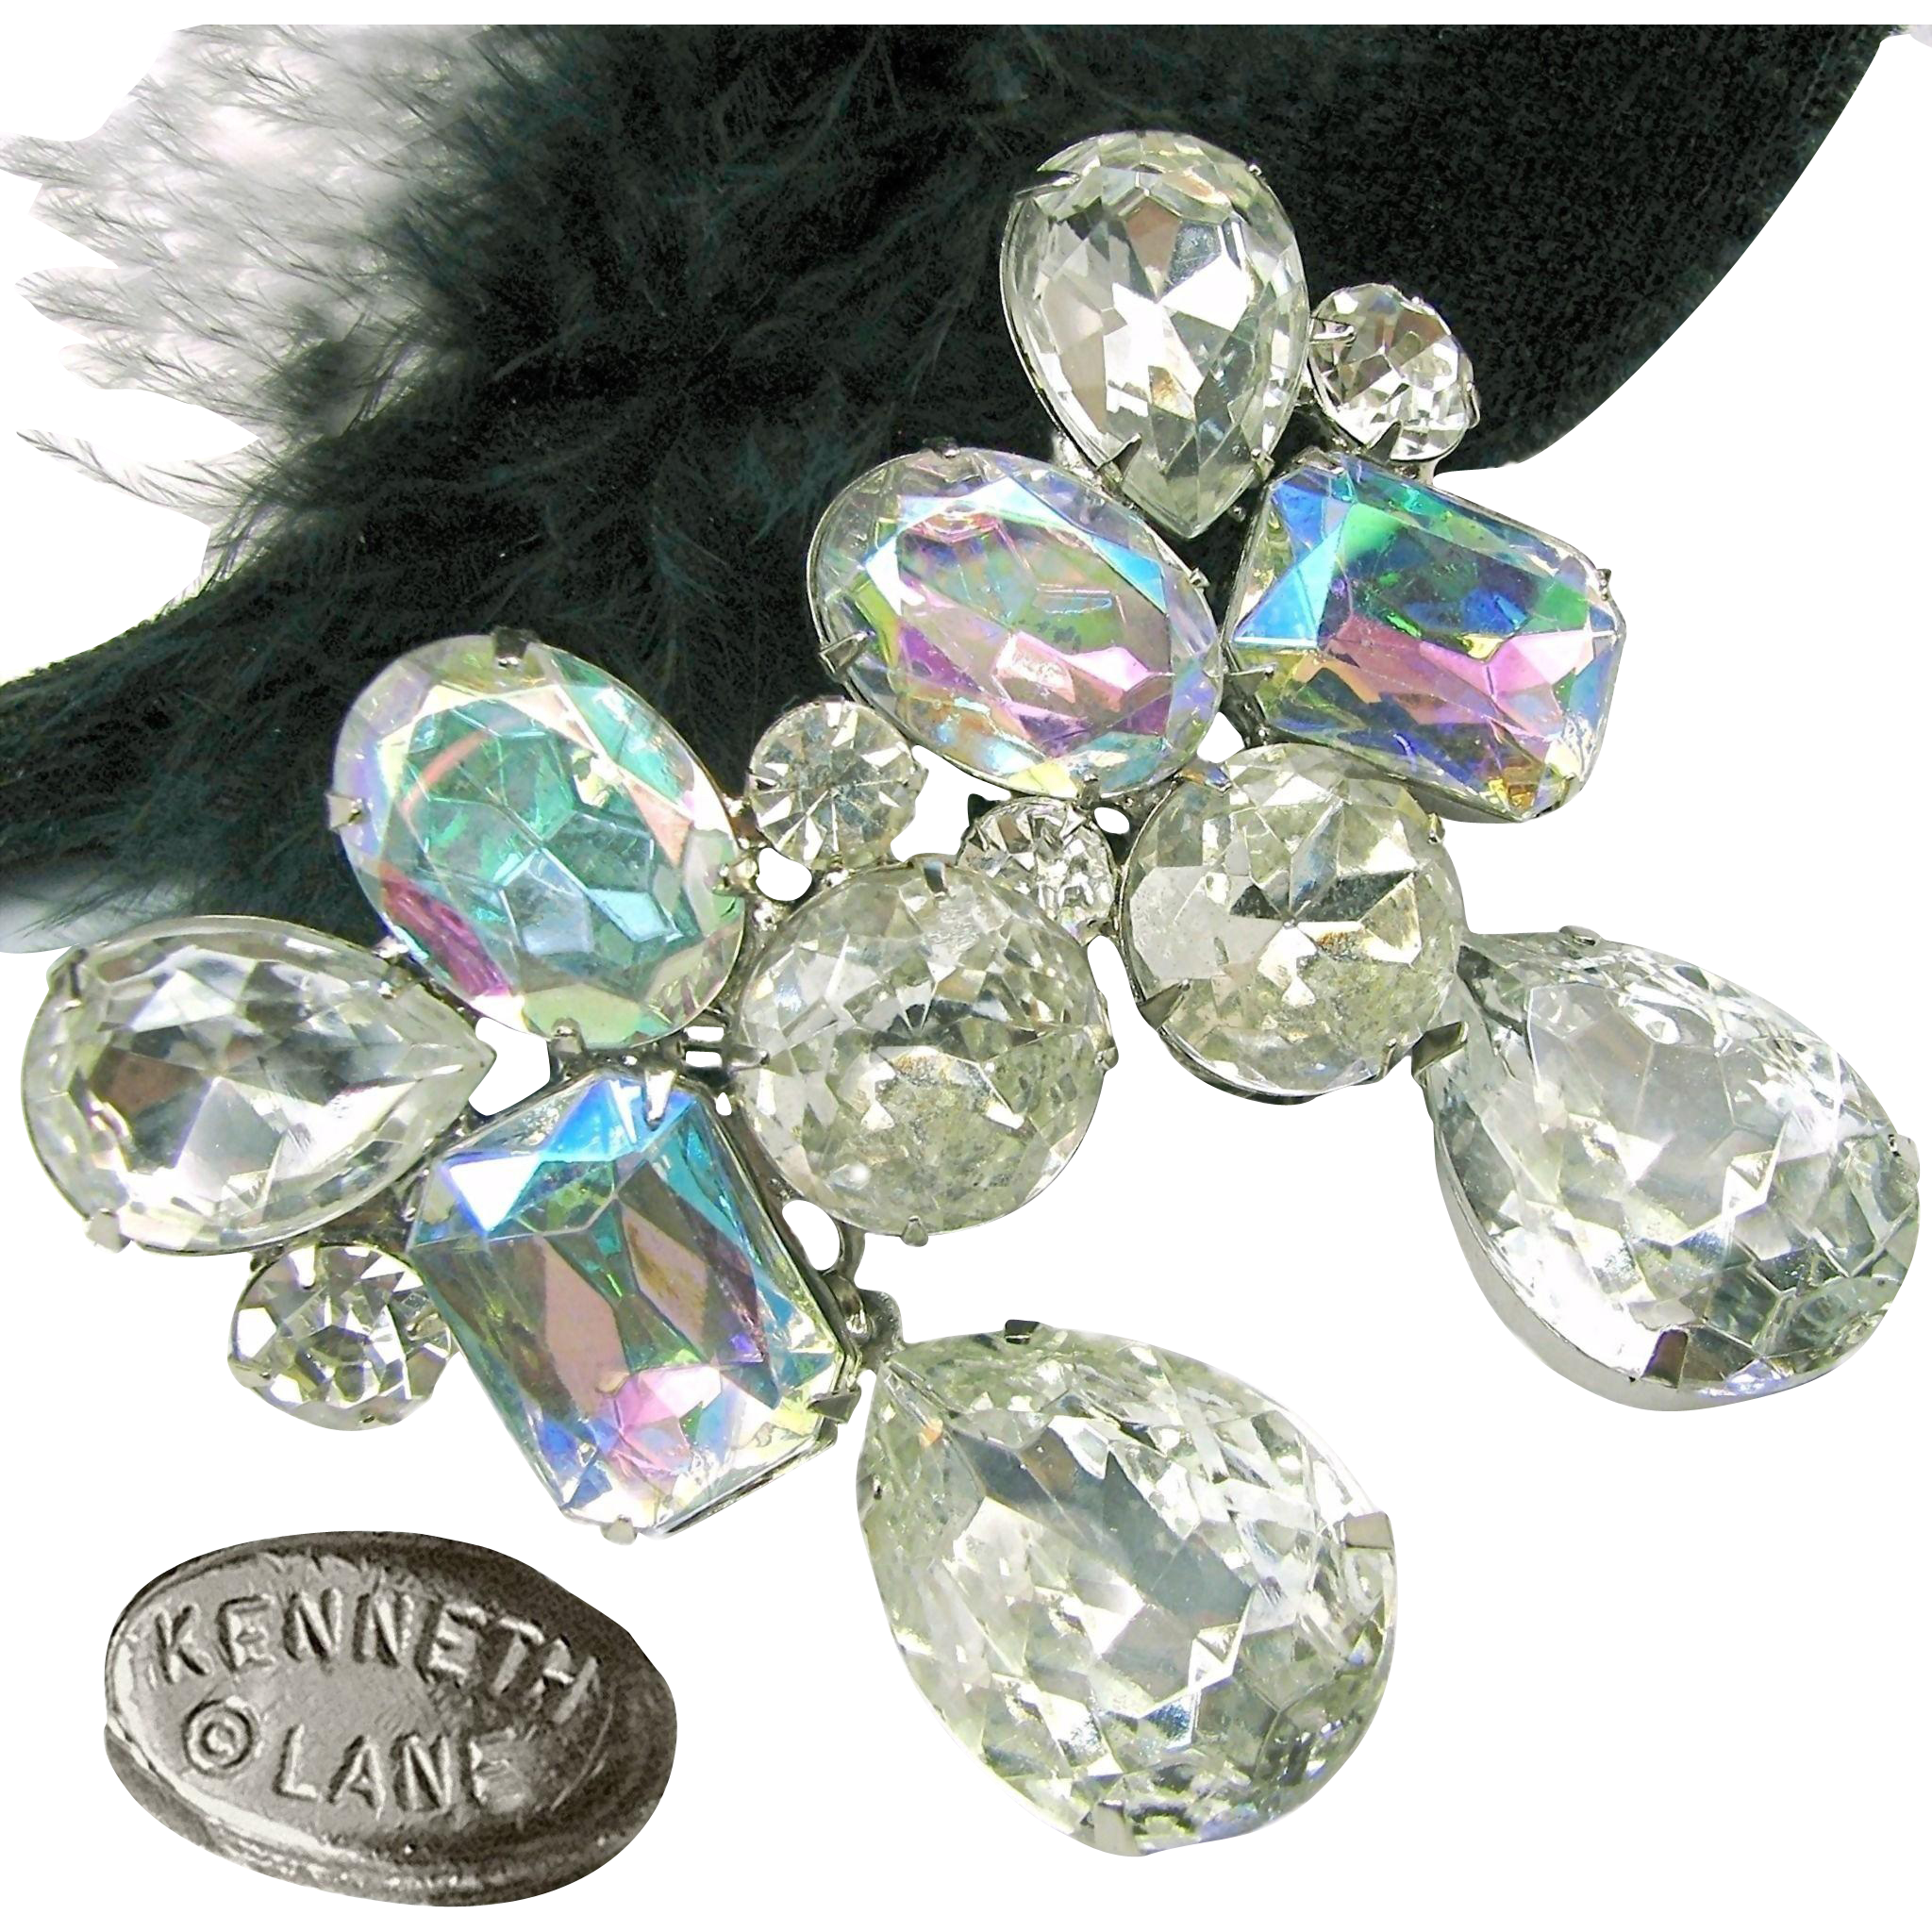 Vintage Drippy Kenneth J Lane Earrings of Brilliant Clear White 'n Rainbow Rhinestones